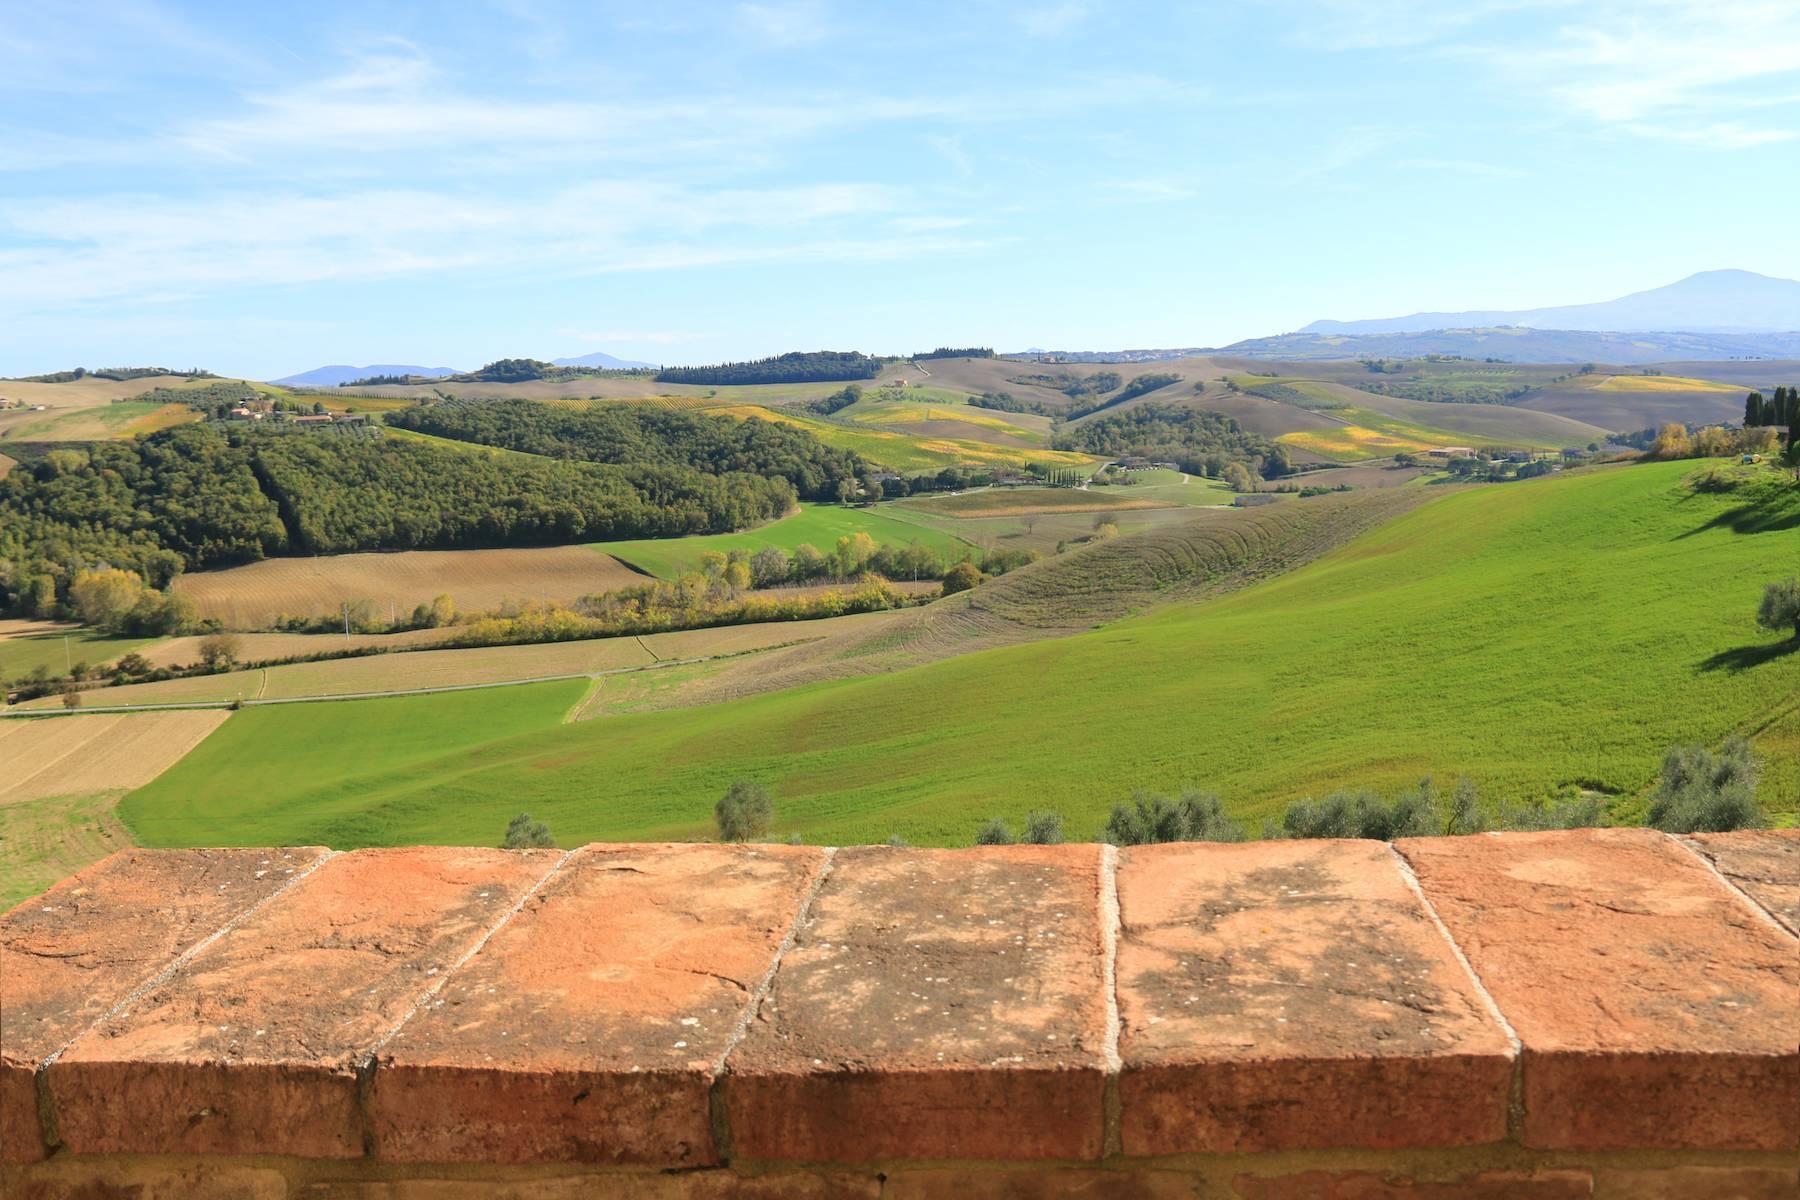 Wunderschönes Schloss im Herzen der Toskana - 7